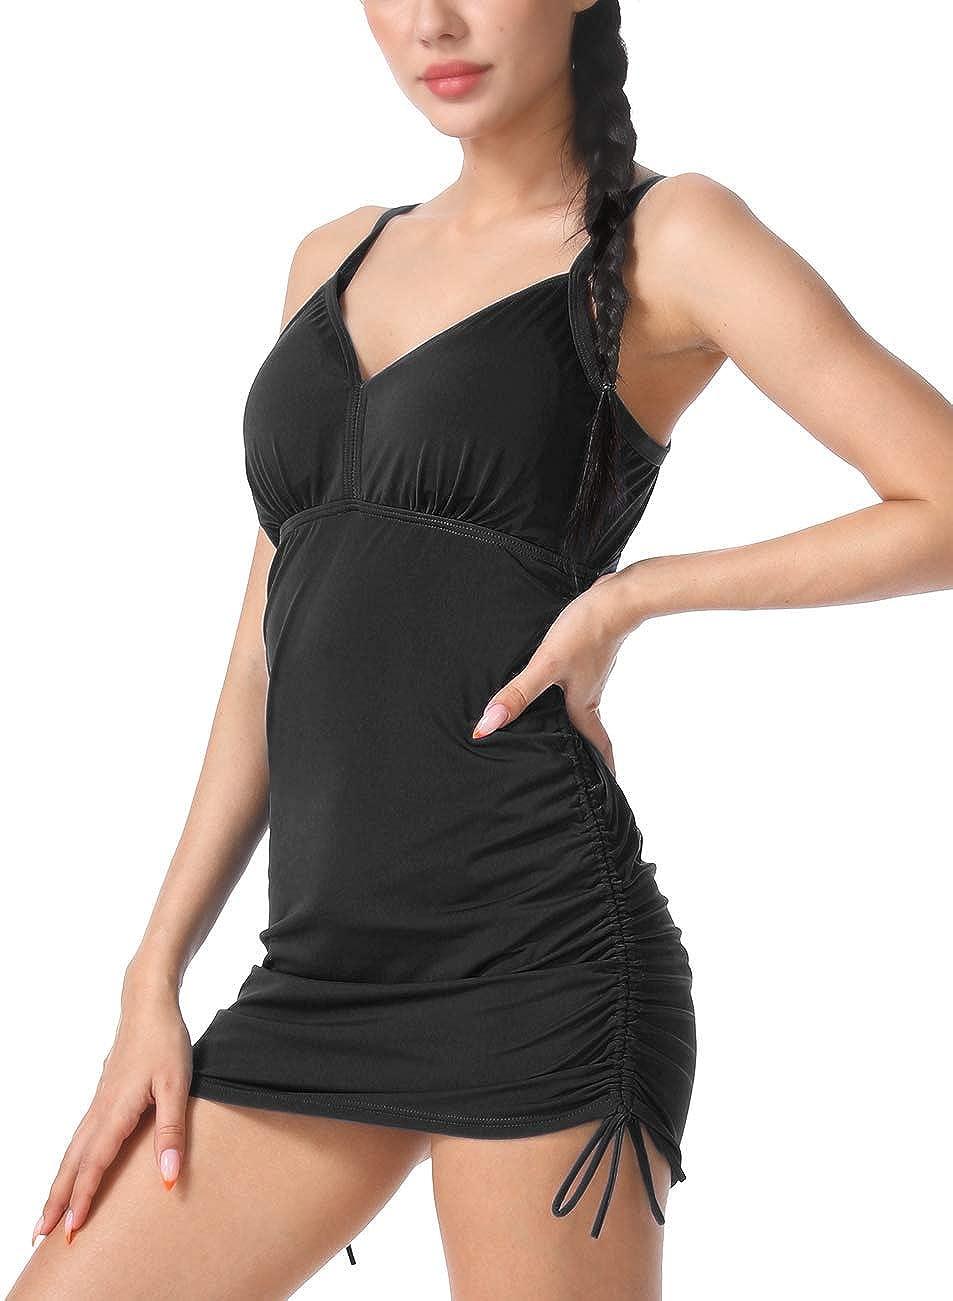 Septangle Women's Limited time cheap sale V Neck Tankini Tummy Tops Ruc Swimwear Control New Free Shipping